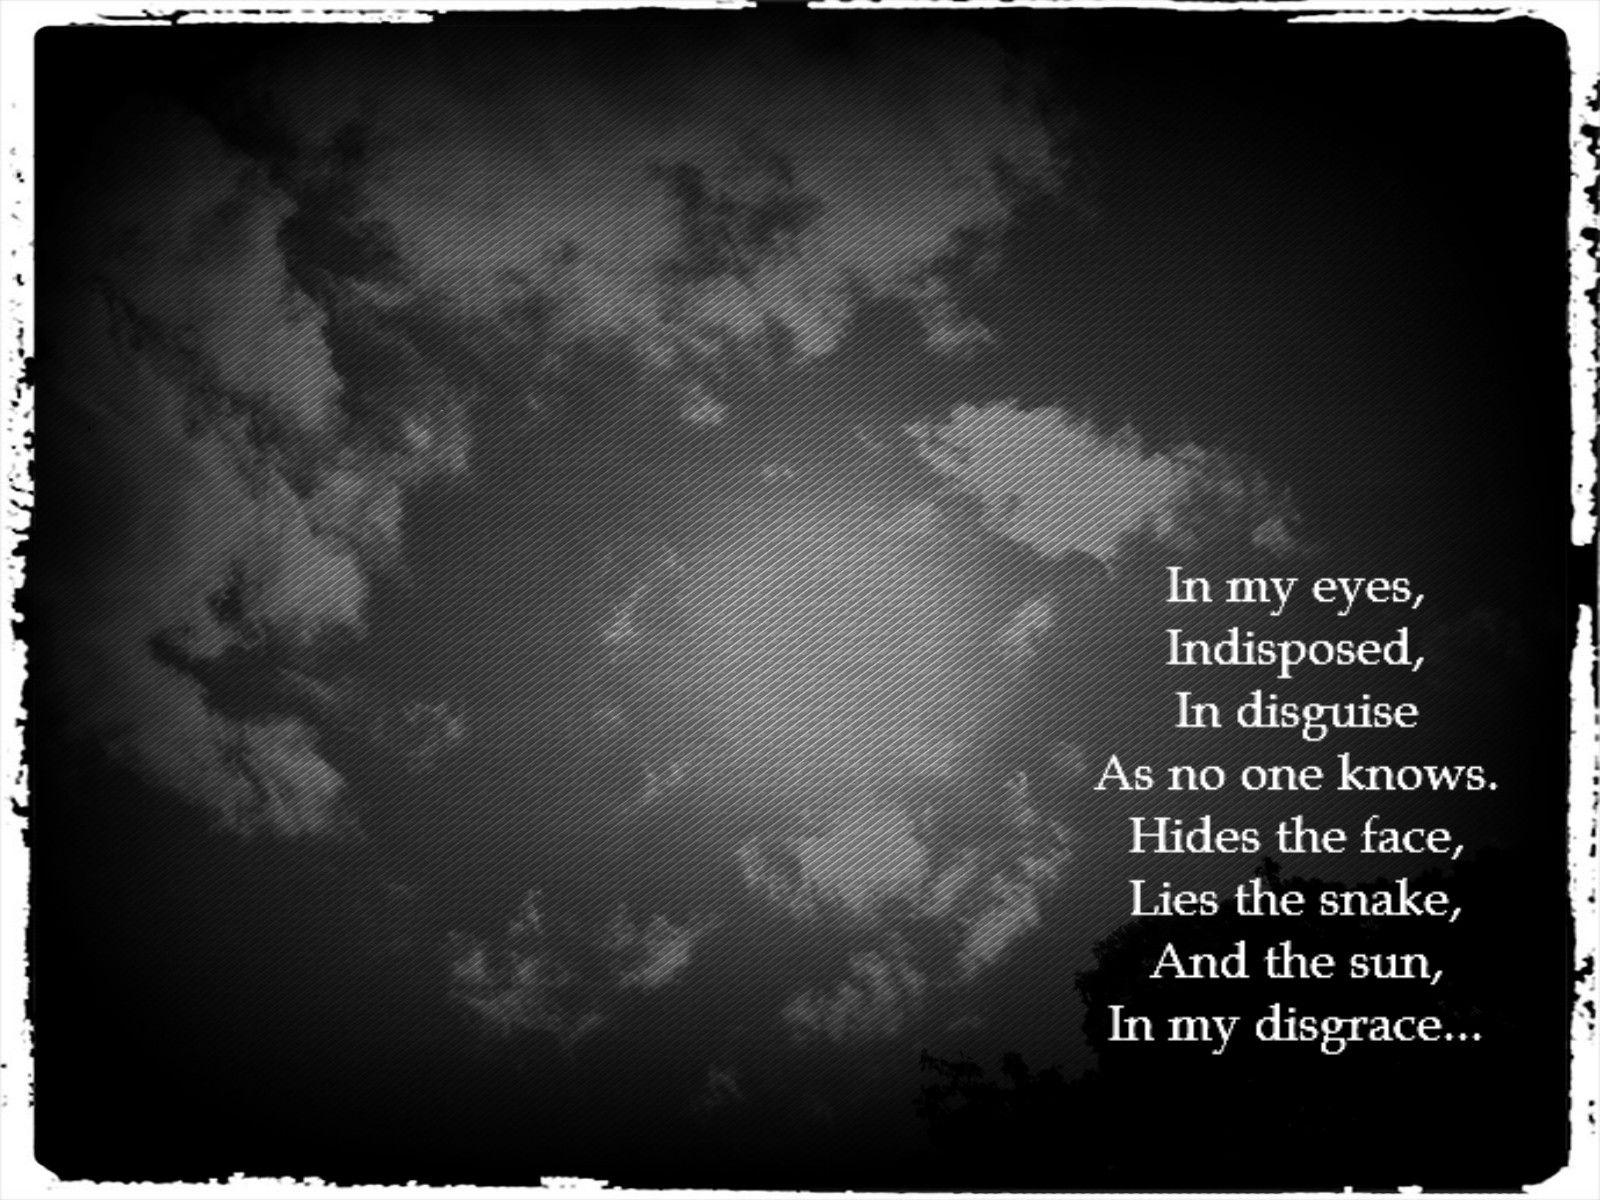 black hole sun lyrics - 736×552